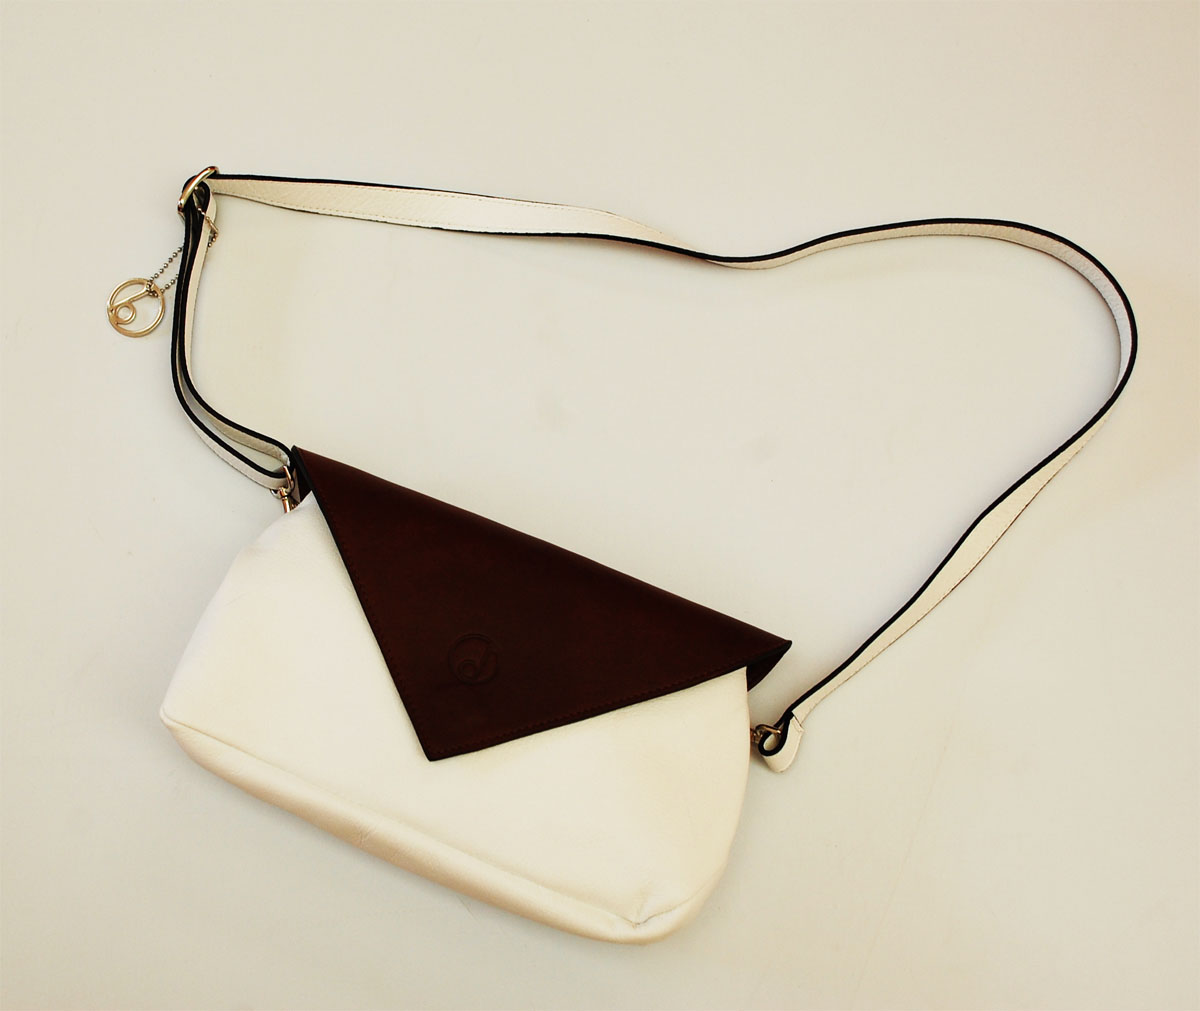 Pochette-Nina-summer16-bianco-marrone-4